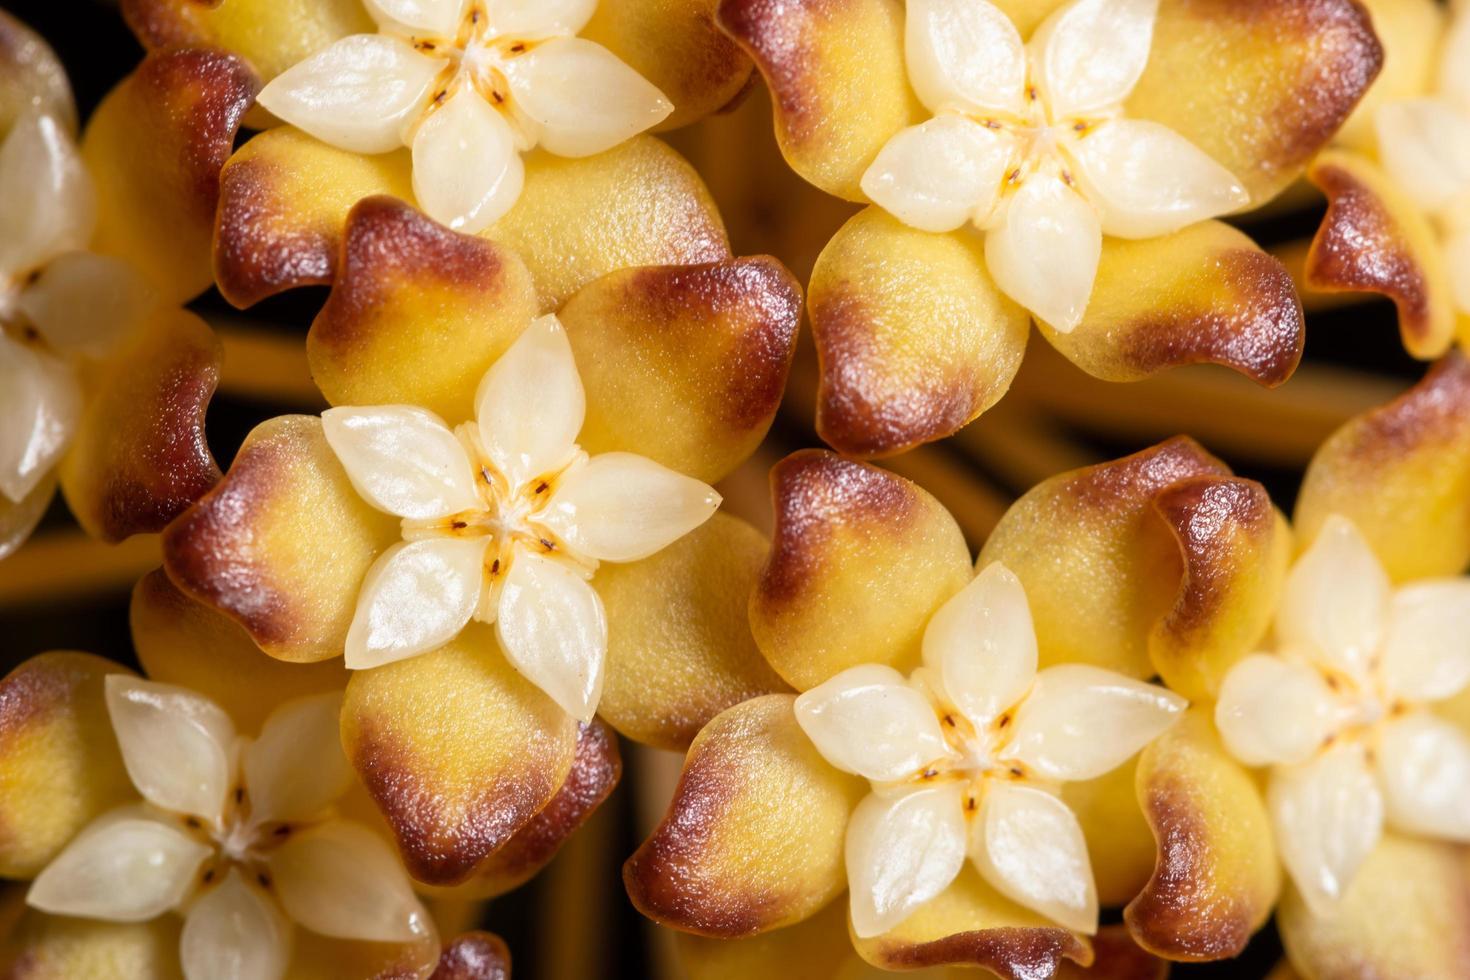 hoya bloemclose-up foto